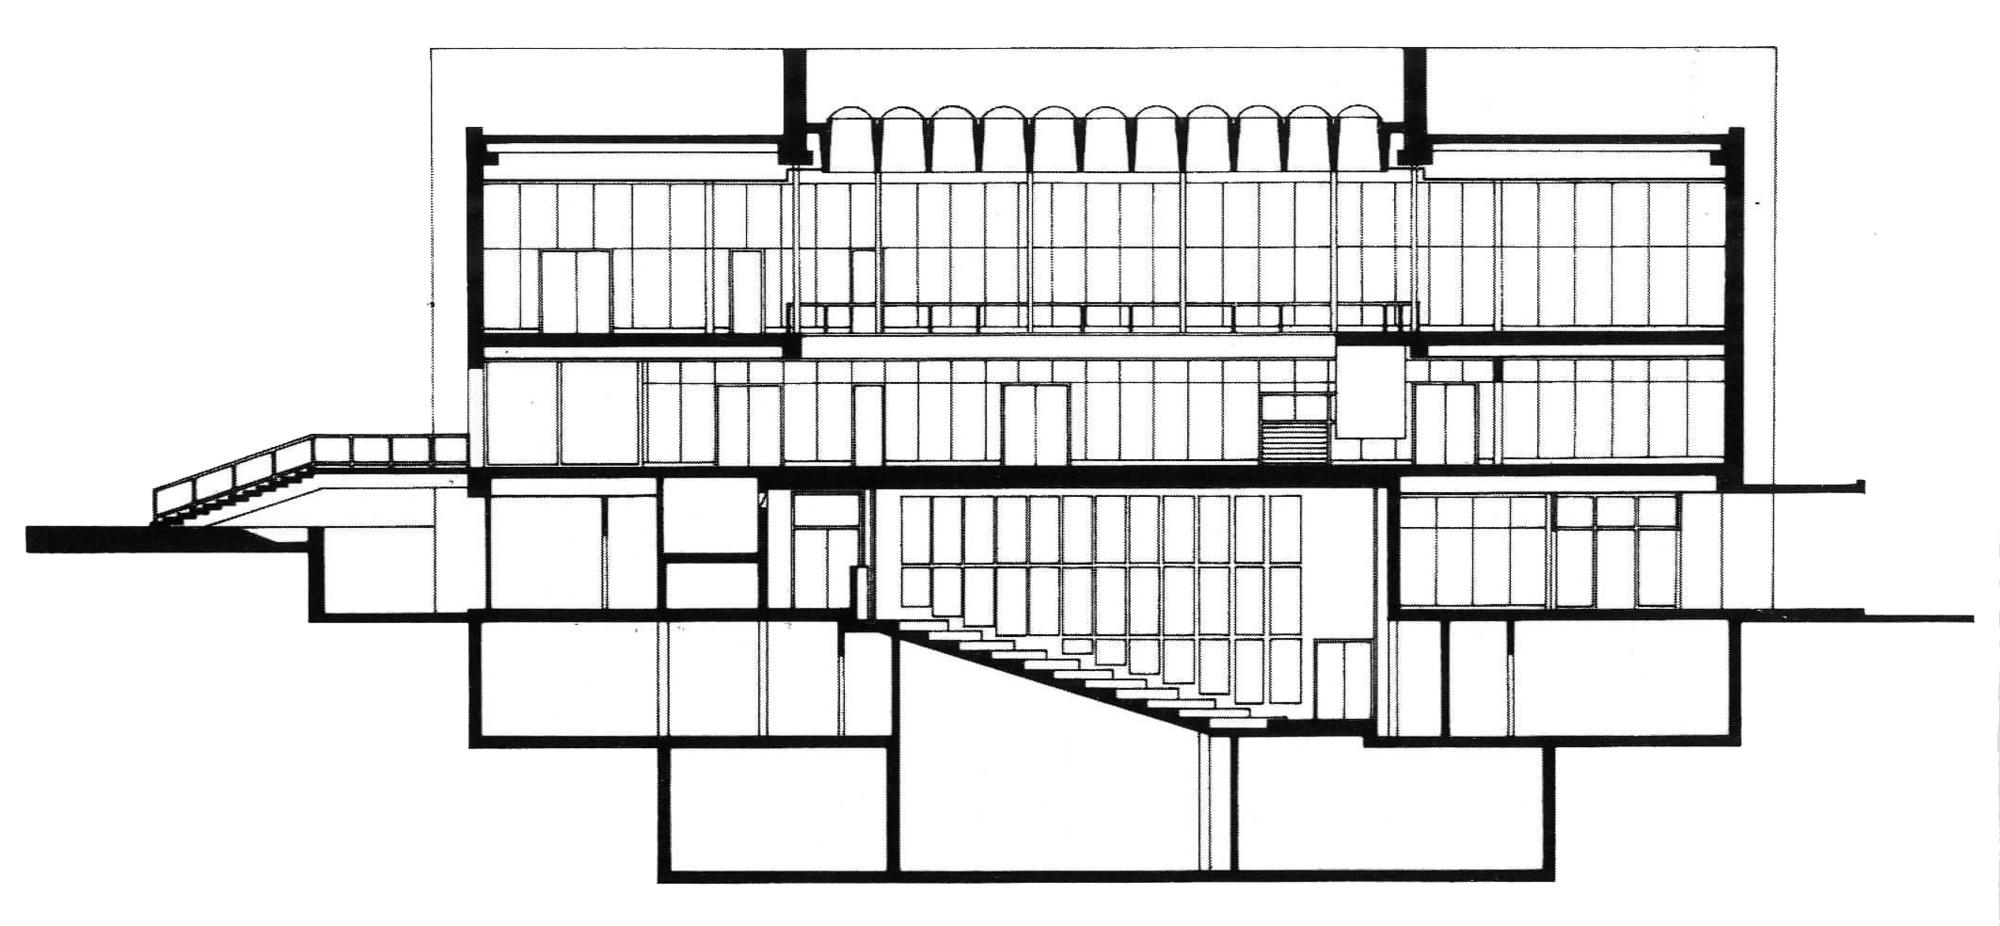 Clásicos de Arquitectura: Instituto de Arte Munson-Williams-Proctor (MWPAI) / Philip Johnson